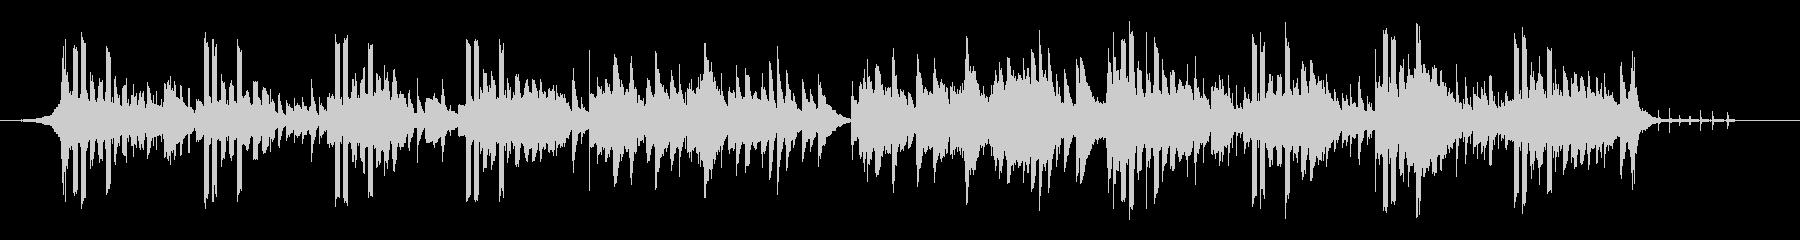 Pop,Electronicaの未再生の波形